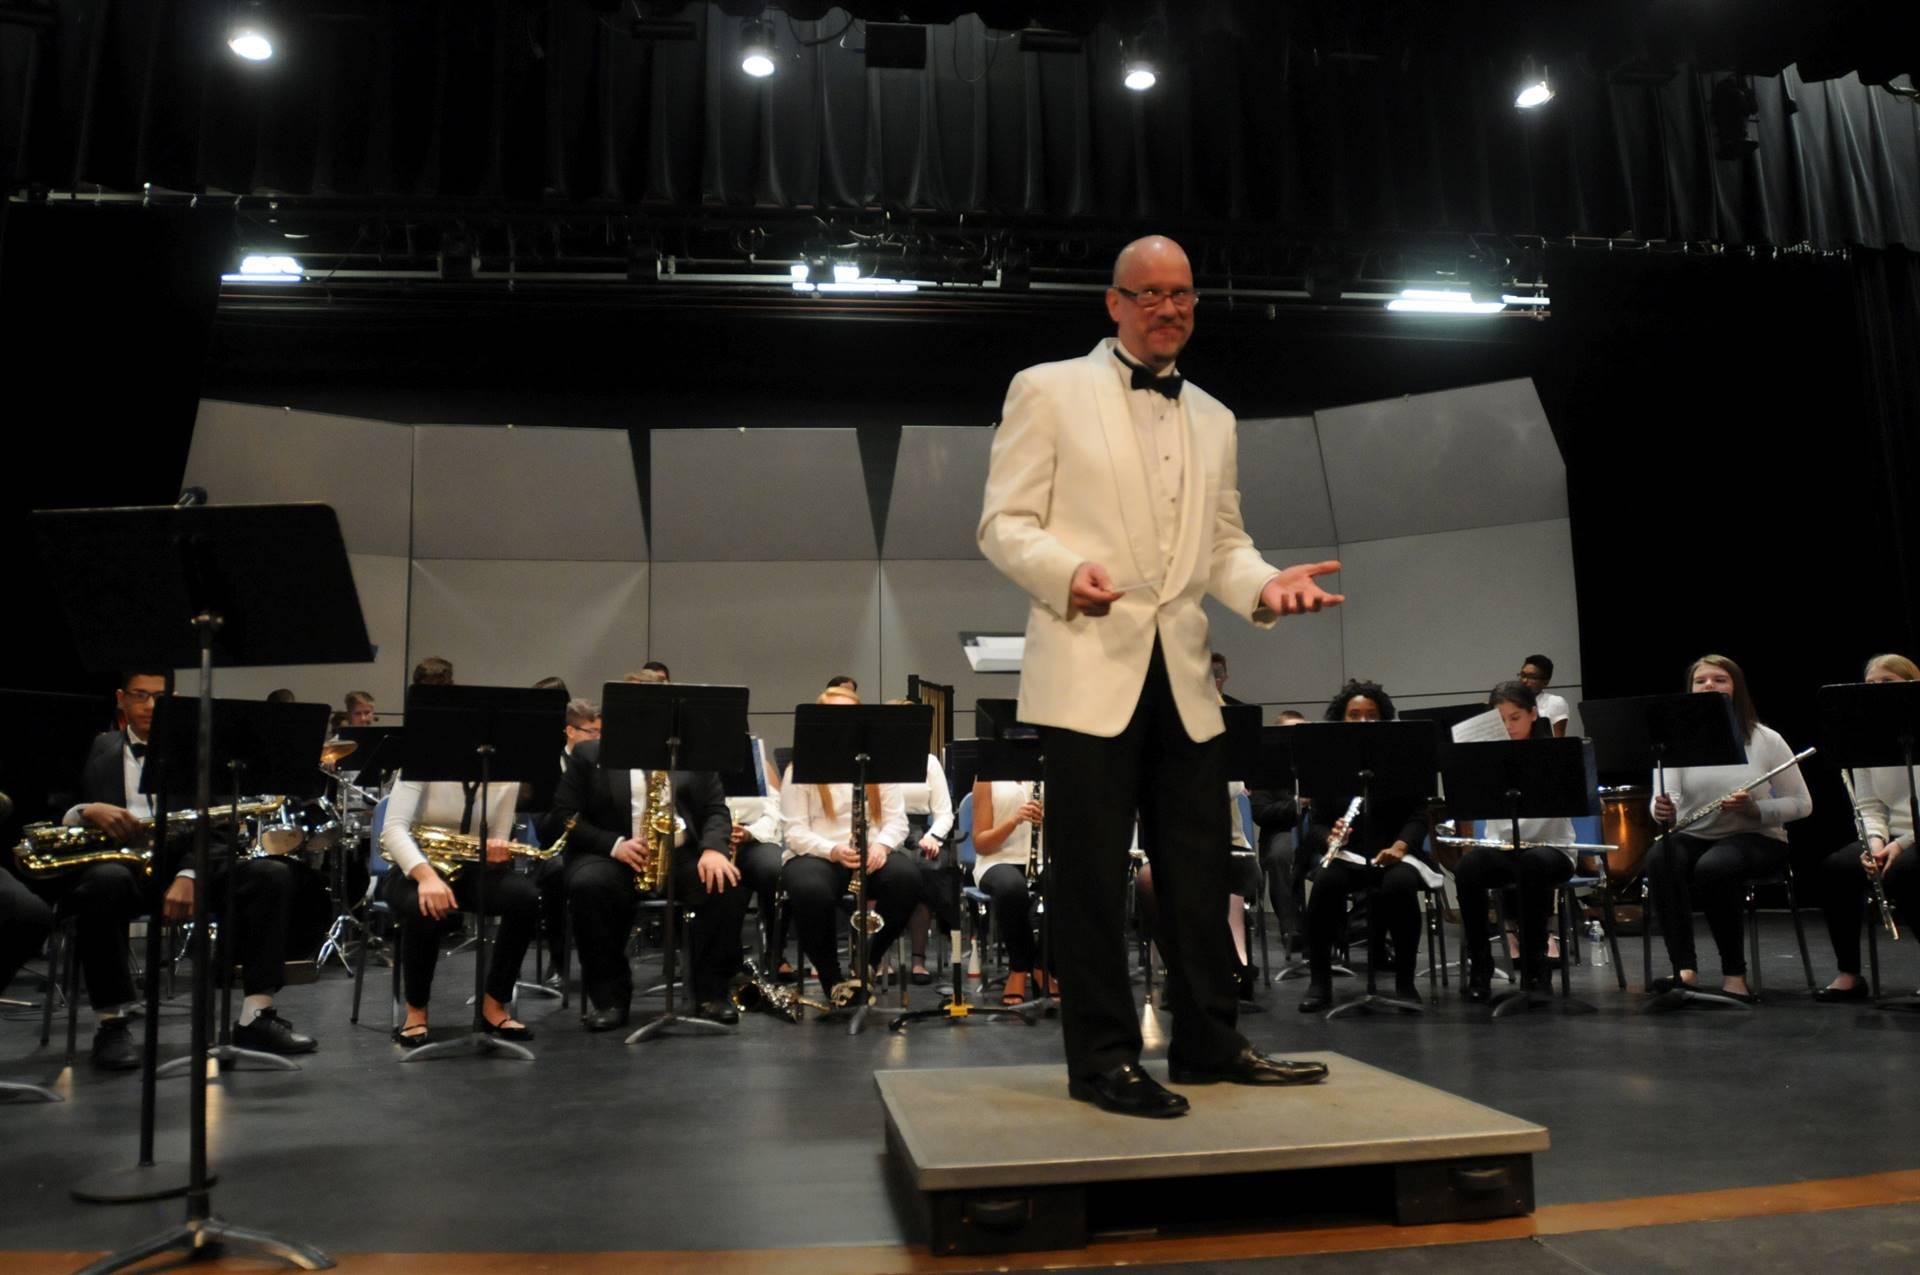 Greg-Conducting